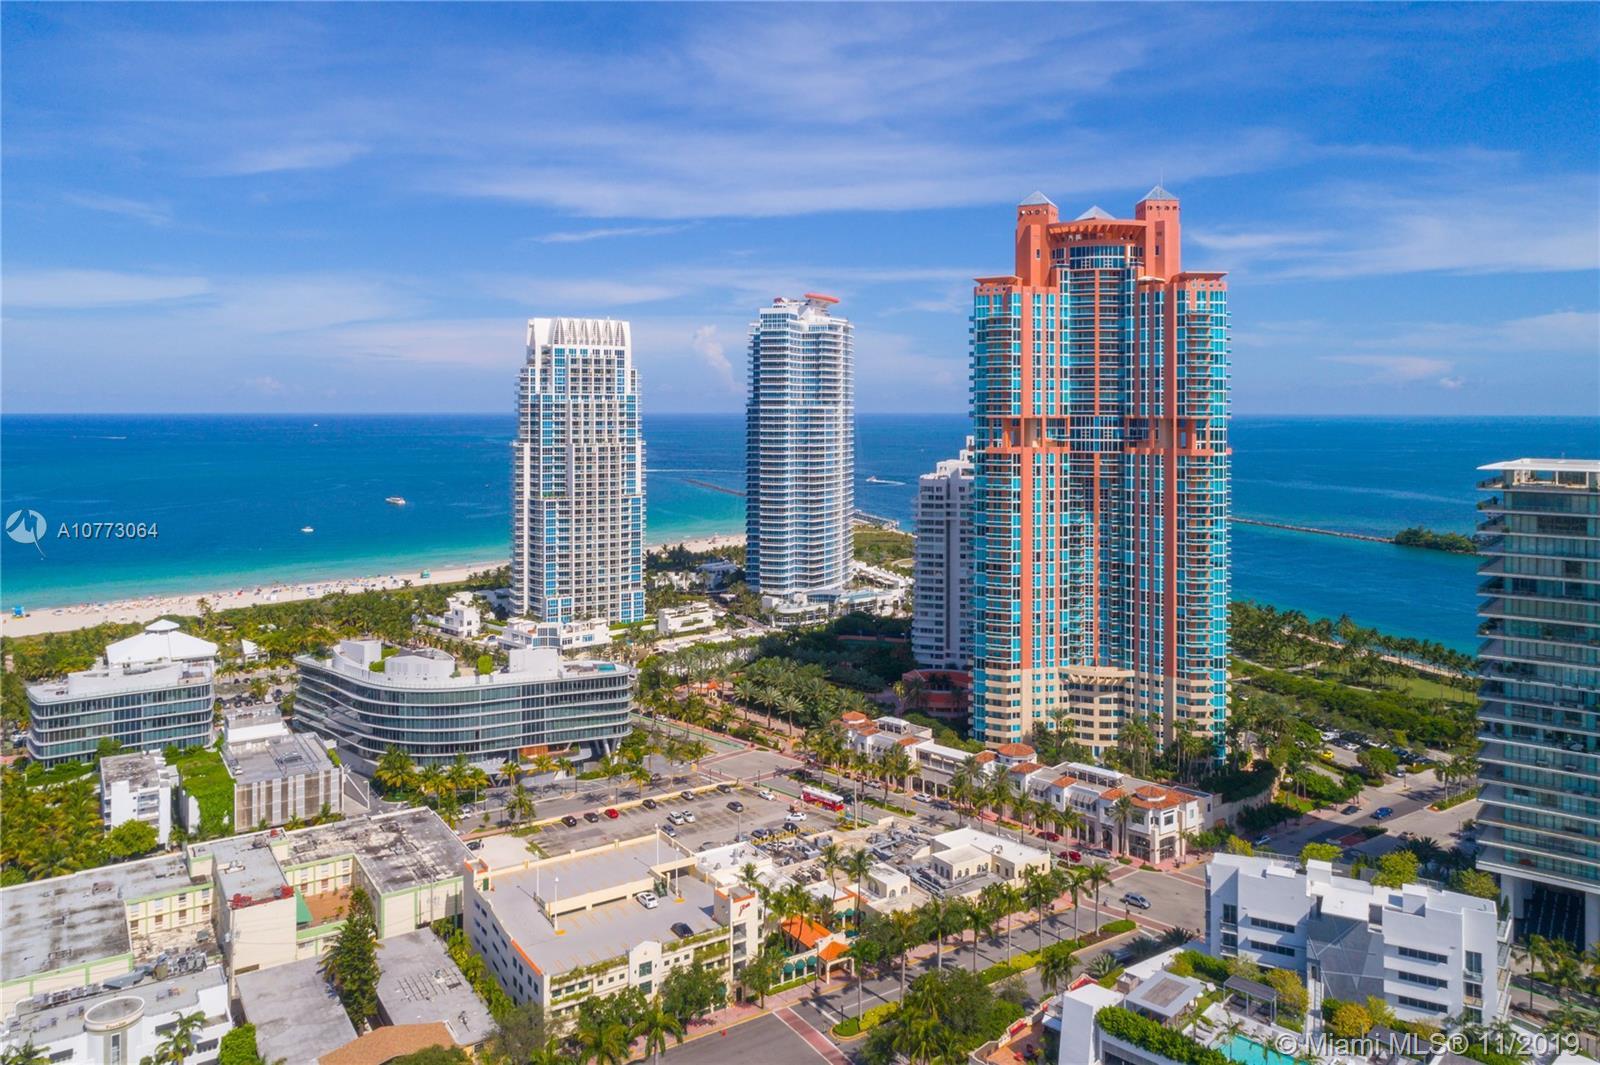 300 S Pointe Dr #3304, Miami Beach FL 33139